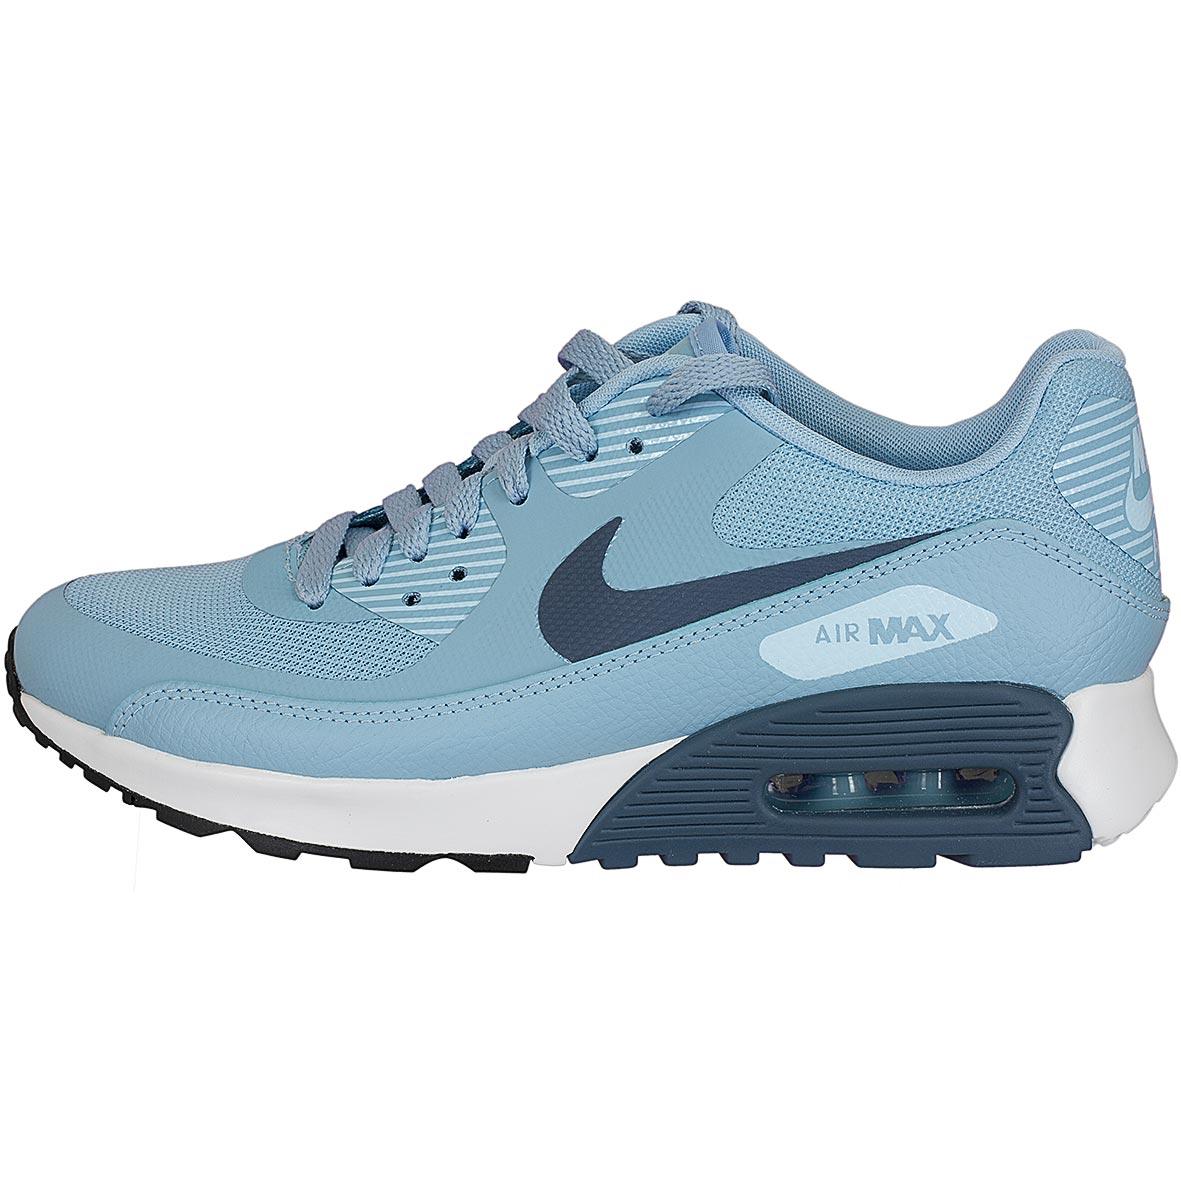 nike damen sneaker air max 90 ultra 2 0 blau hier bestellen. Black Bedroom Furniture Sets. Home Design Ideas